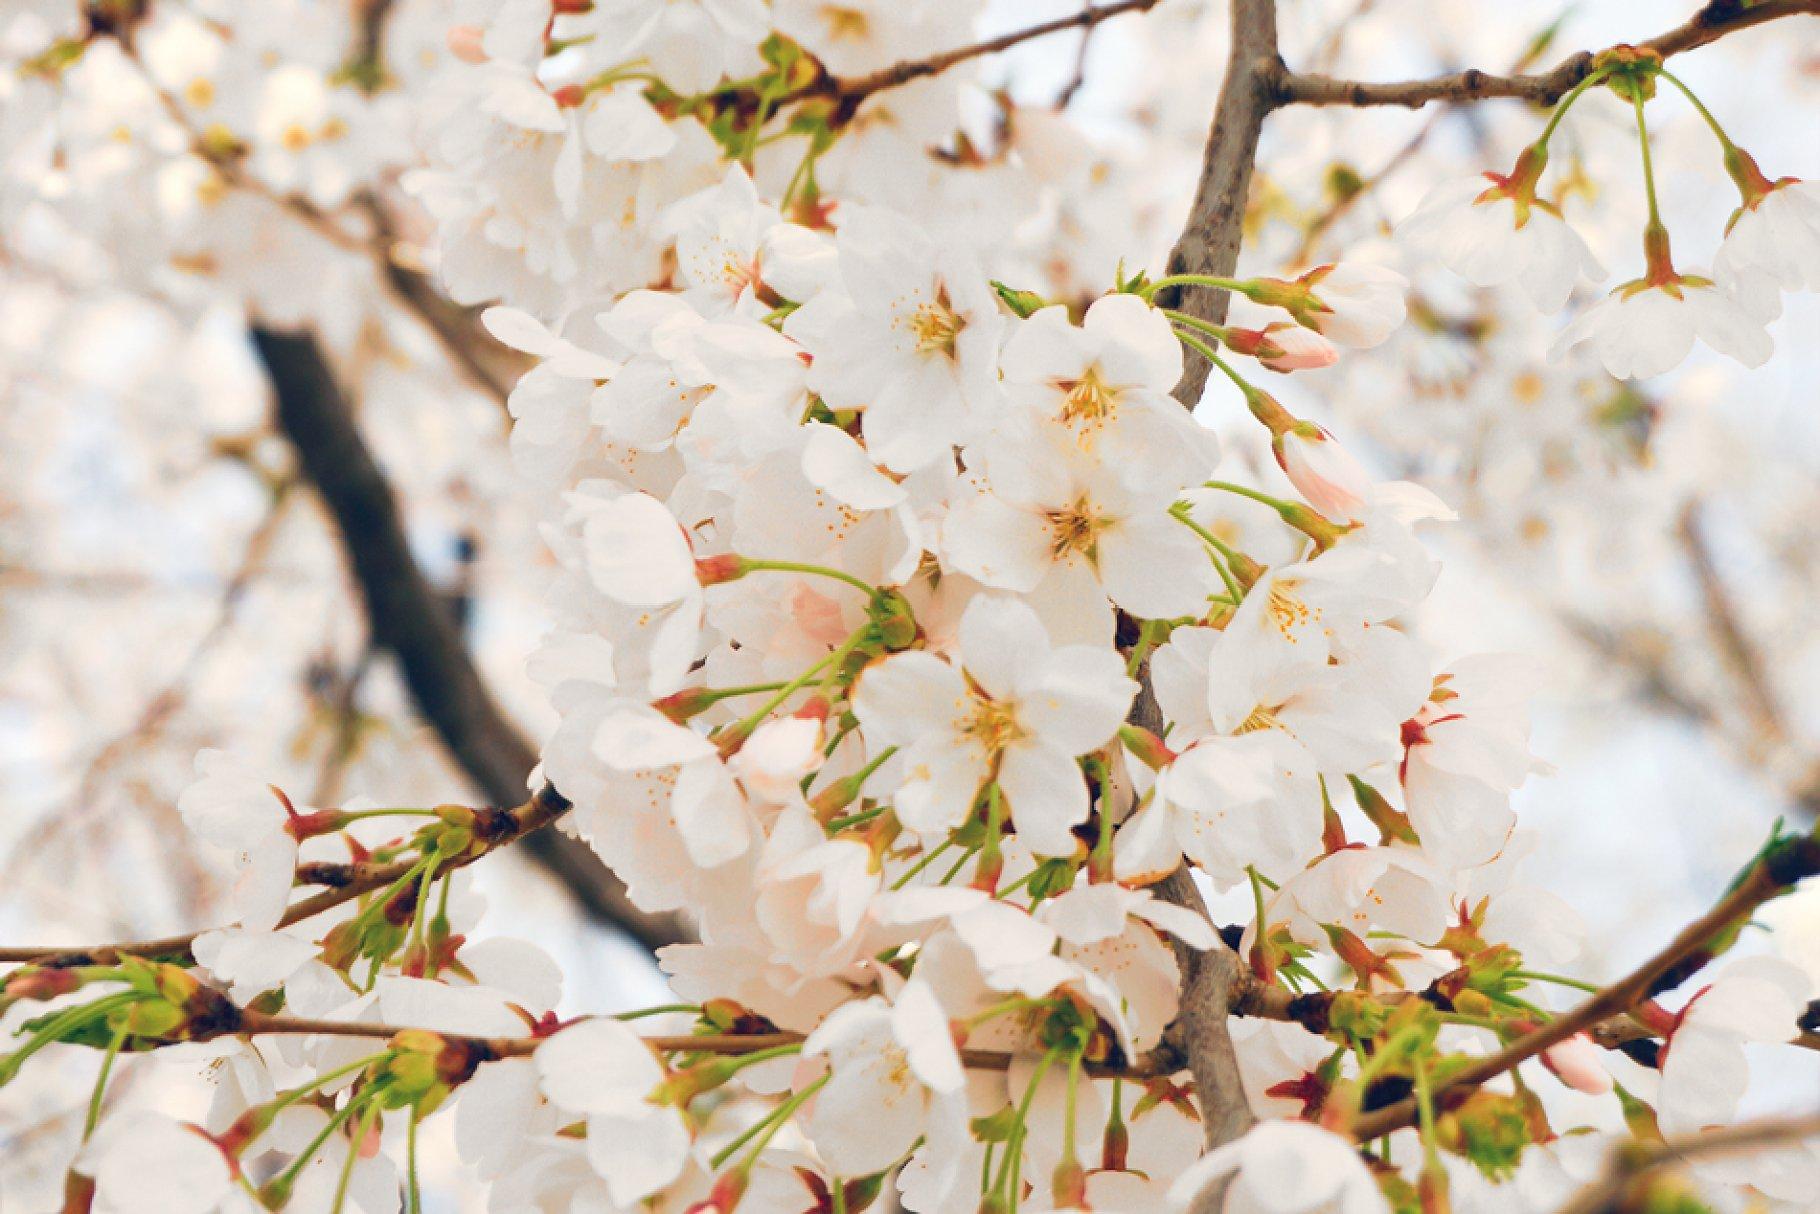 White Cherry Blossoms High Quality Nature Stock Photos